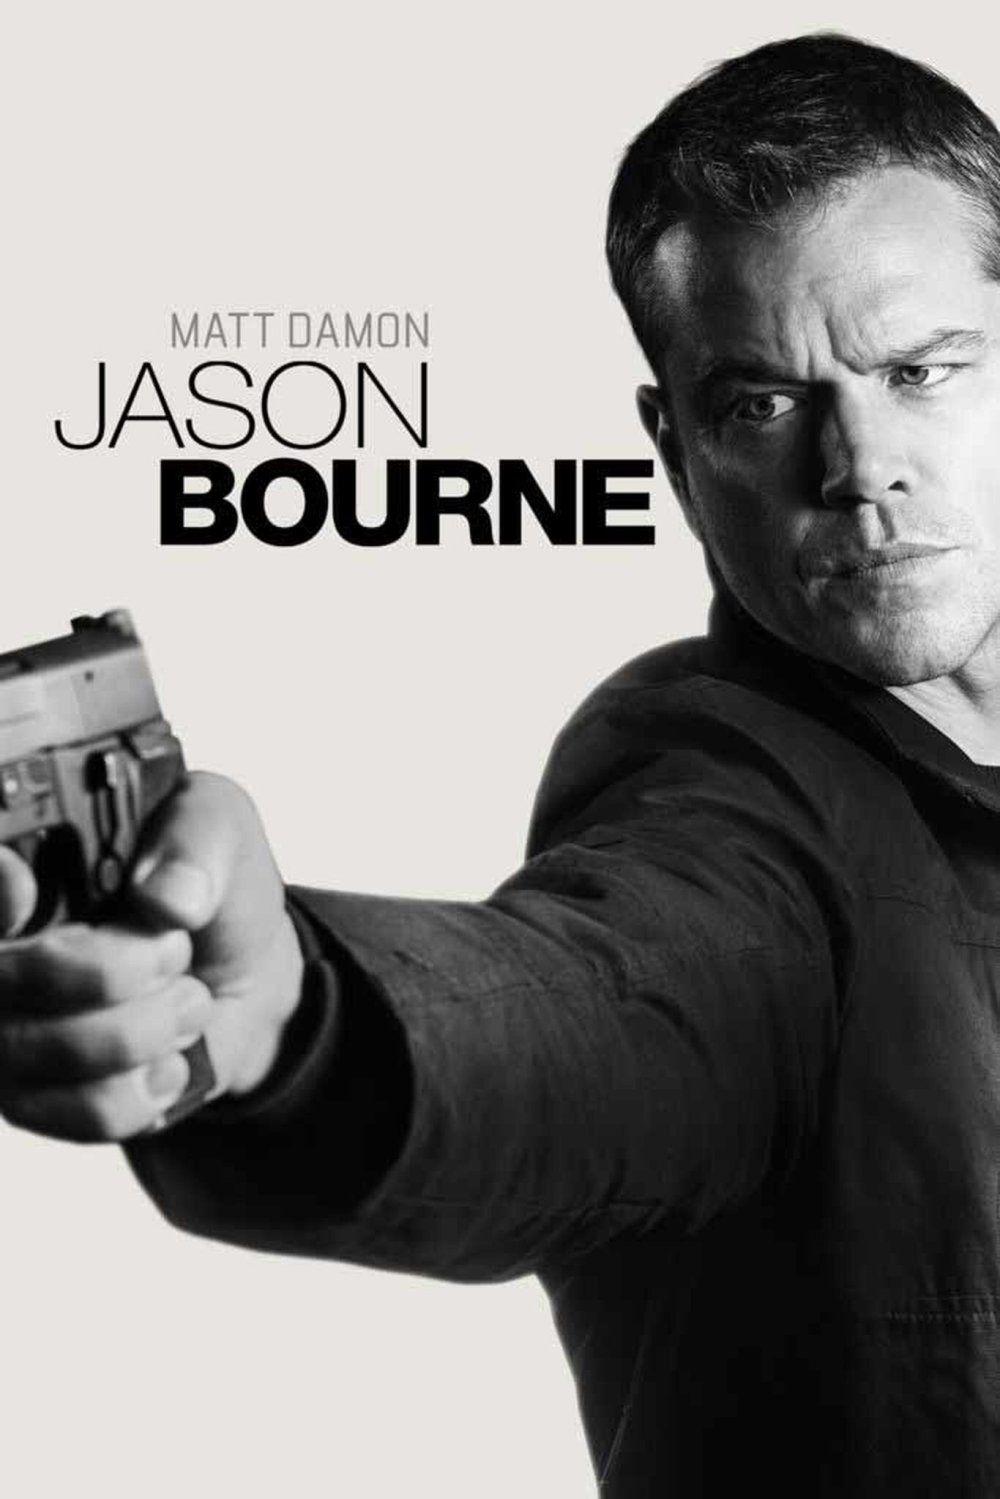 The Bourne Ultimate Collection Blu Ray Digital Box Set In 2021 Jason Bourne Matt Damon Jason Bourne Jason Bourne 2016